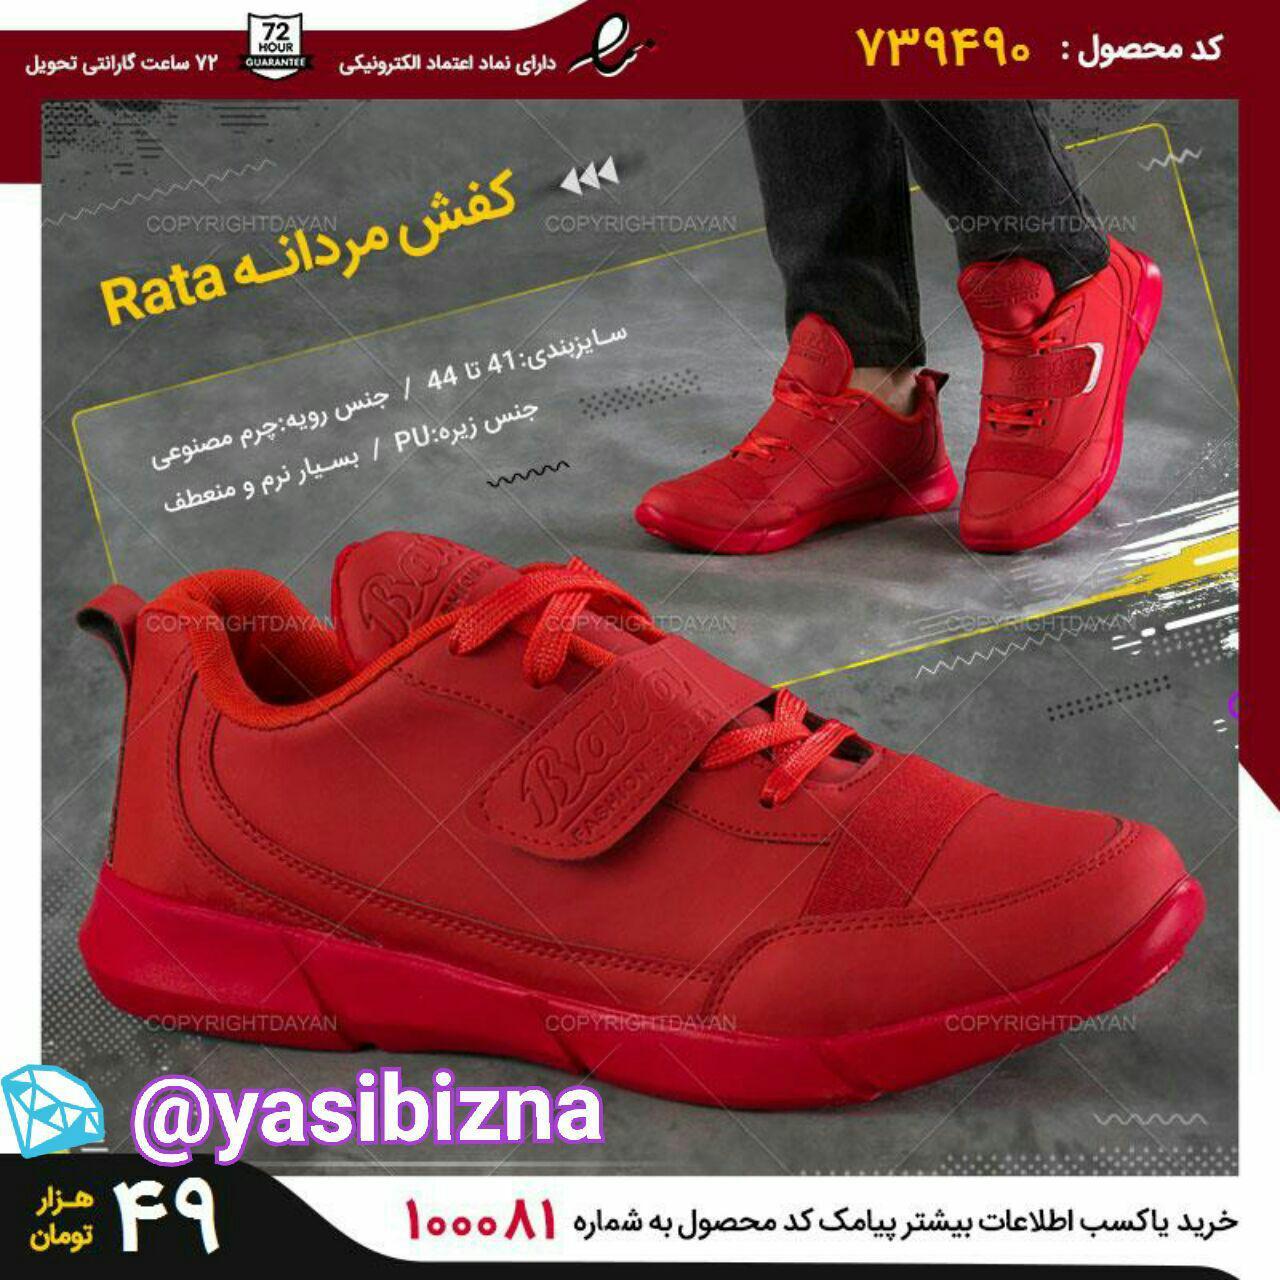 کفش مردانه Rata